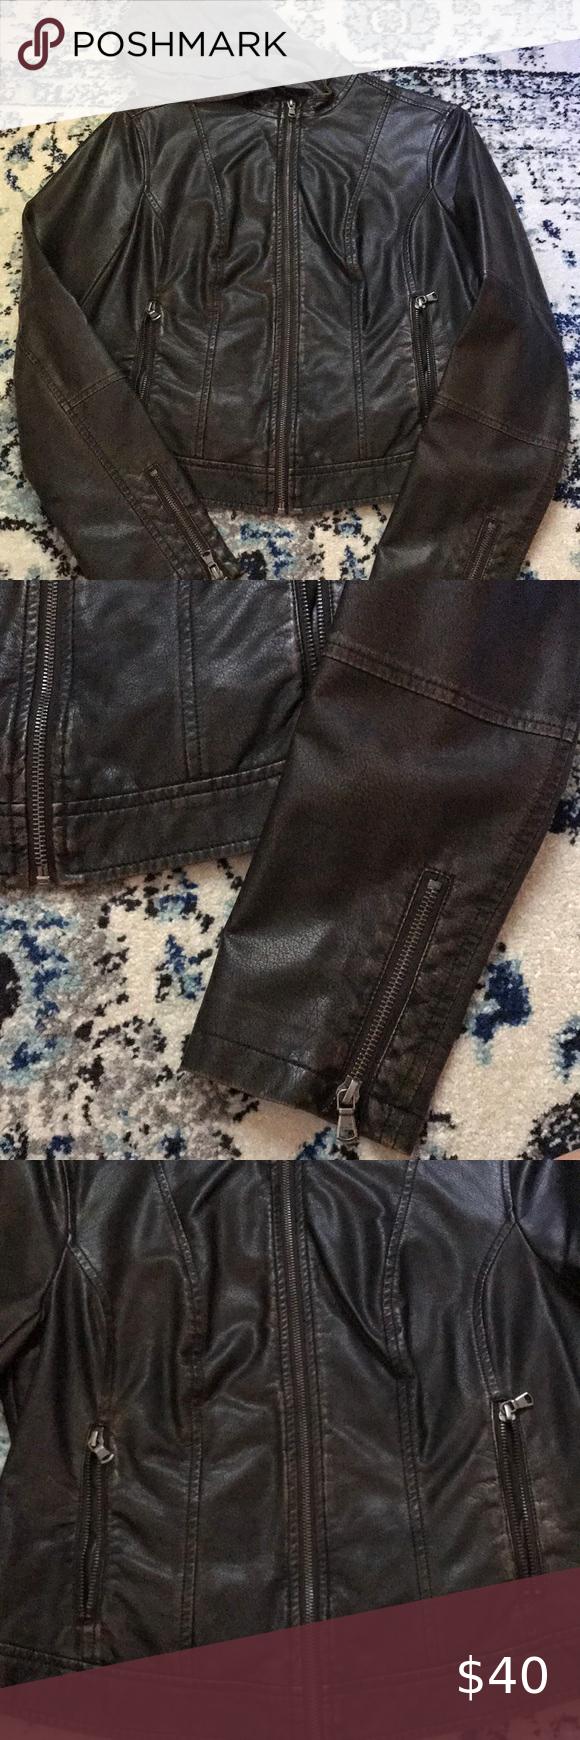 Levi S Leather Jacket With Hood Leather Jacket With Hood Leather Jacket Hooded Jacket [ 1740 x 580 Pixel ]